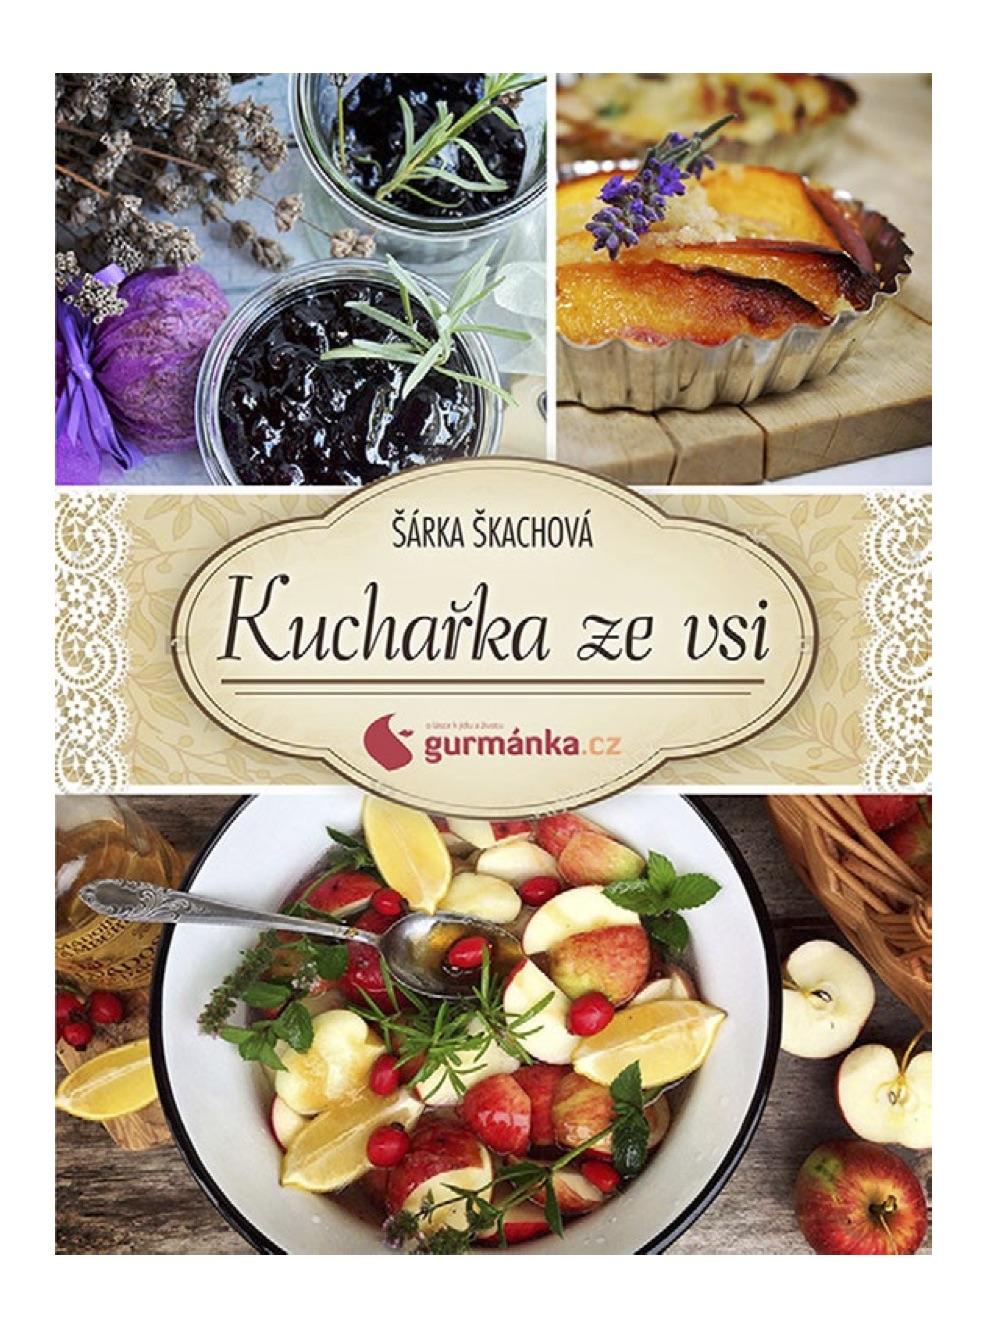 Kuchařka ze vsi od gurmanka.cz - Šárka Škachová